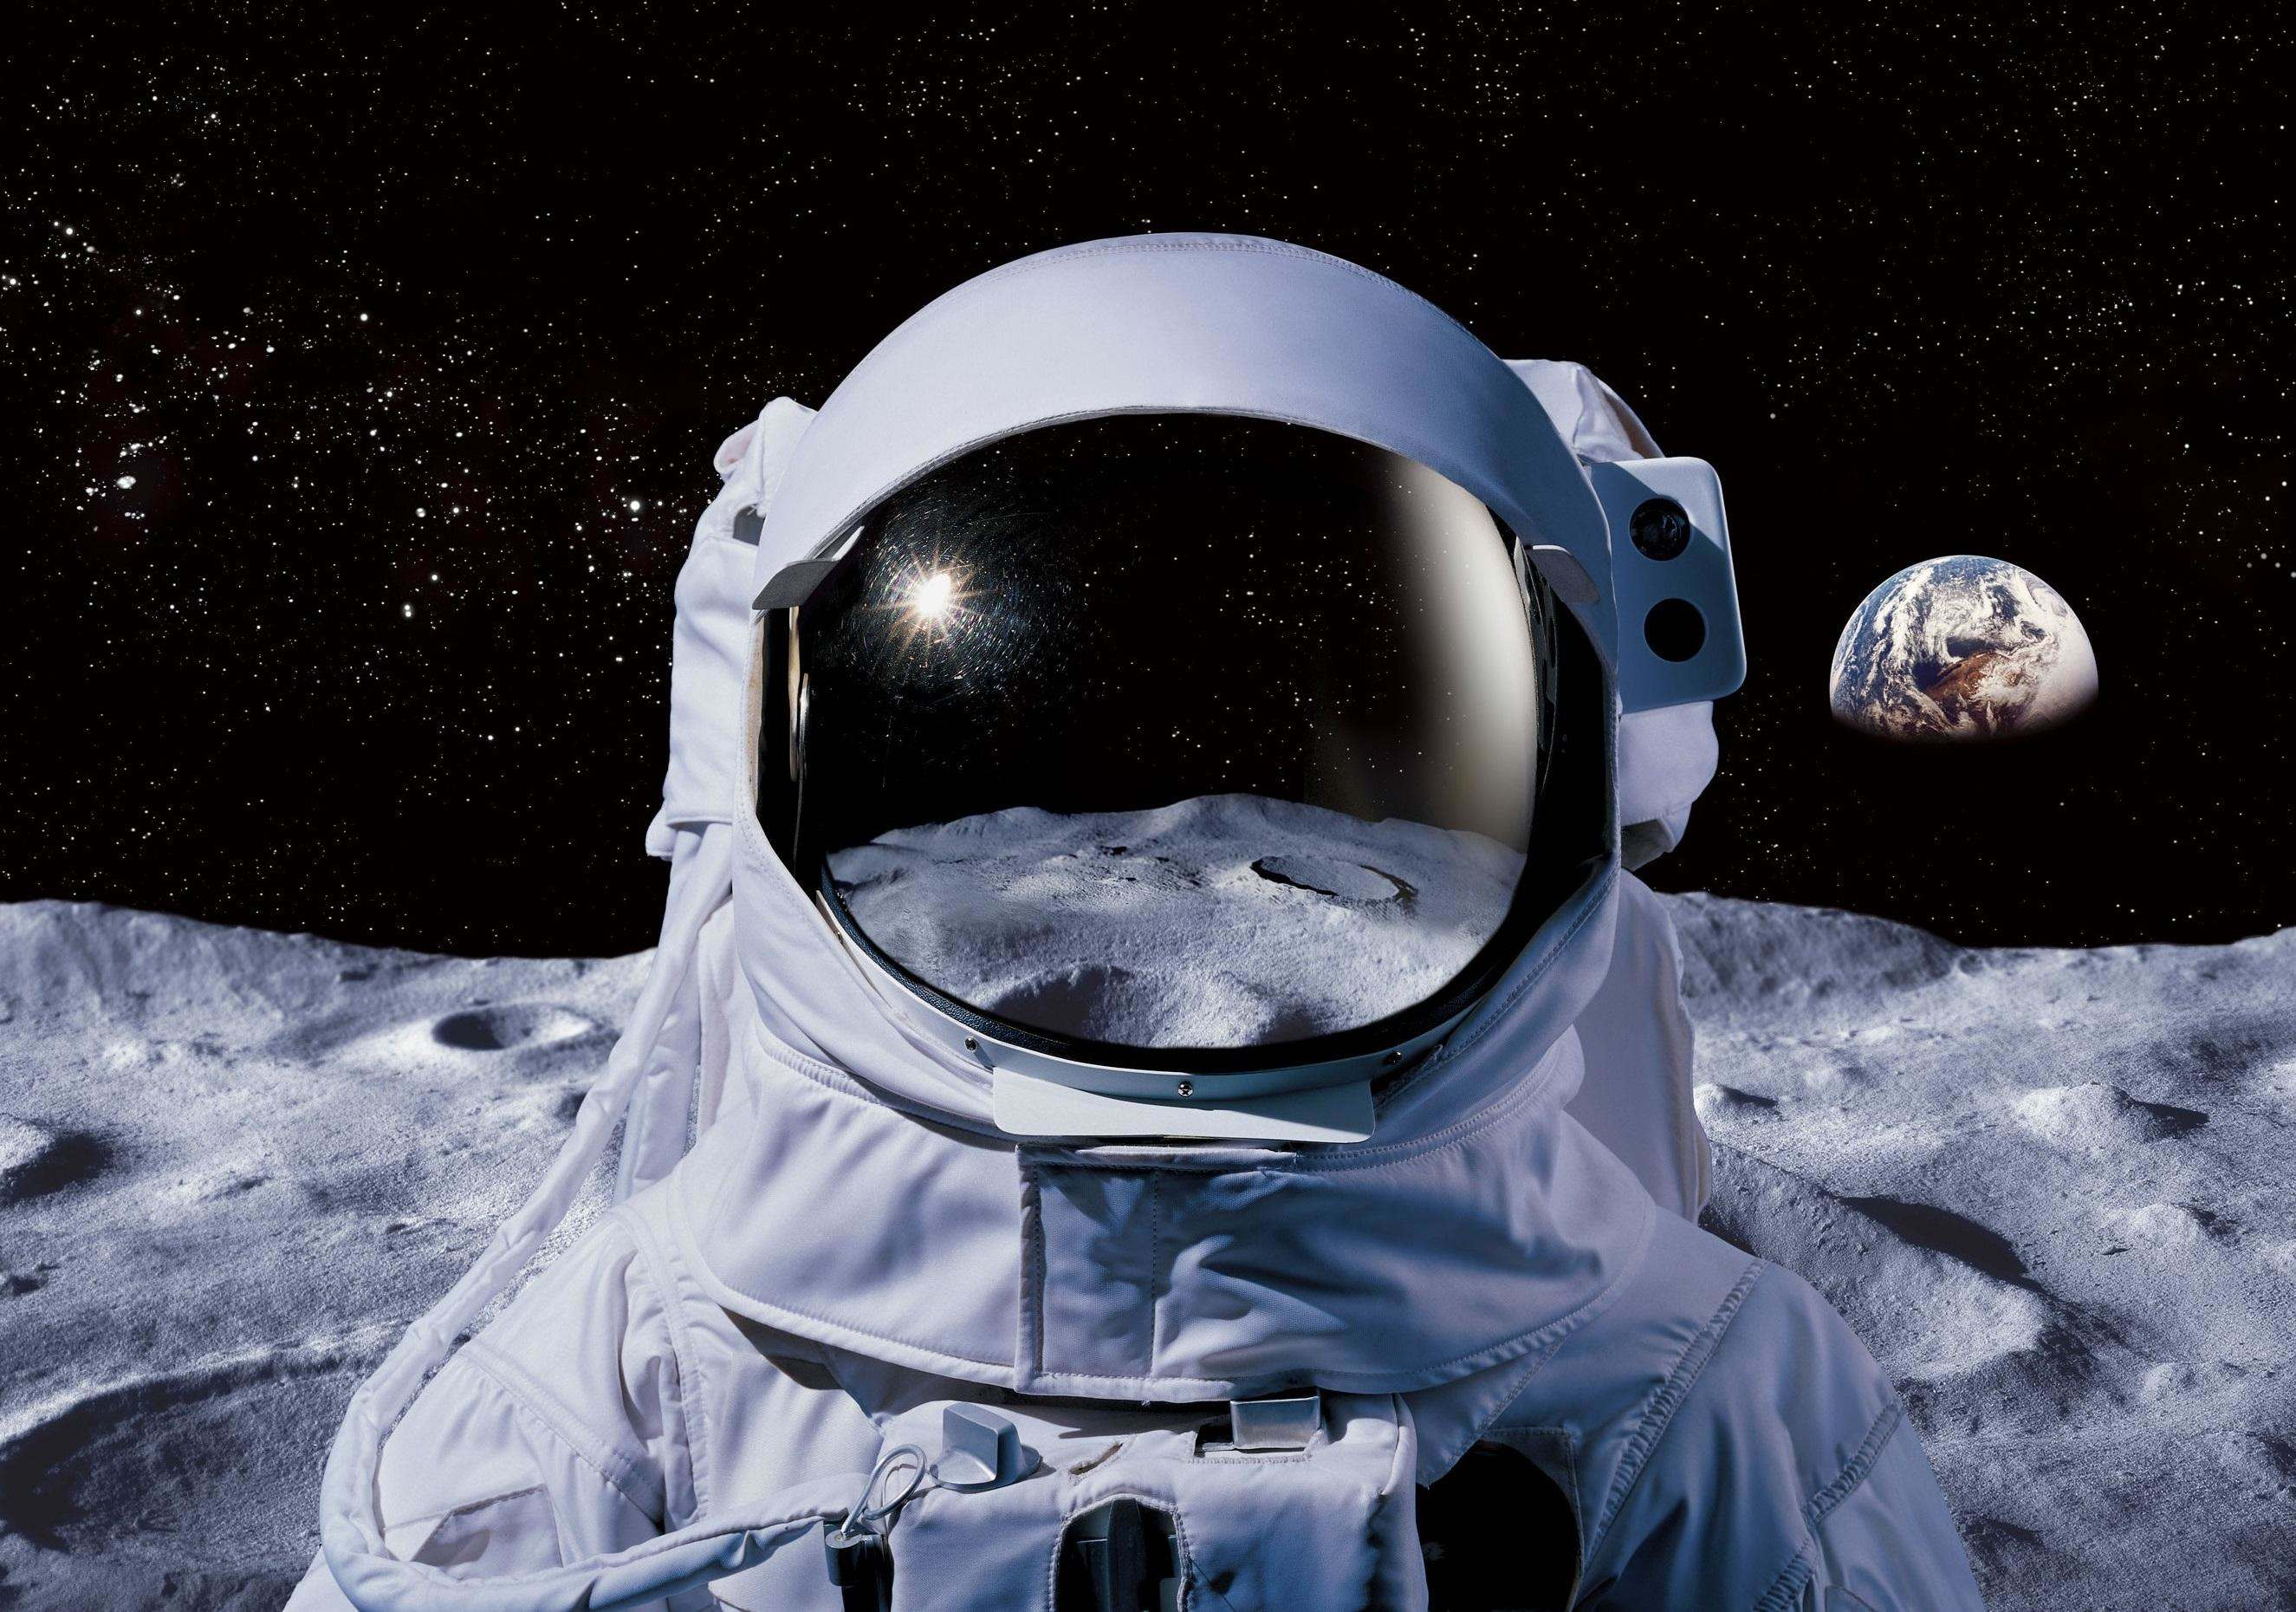 Аромат космосу Kickstarter Eau de Space: новий парфум із запахом зірок і комет.